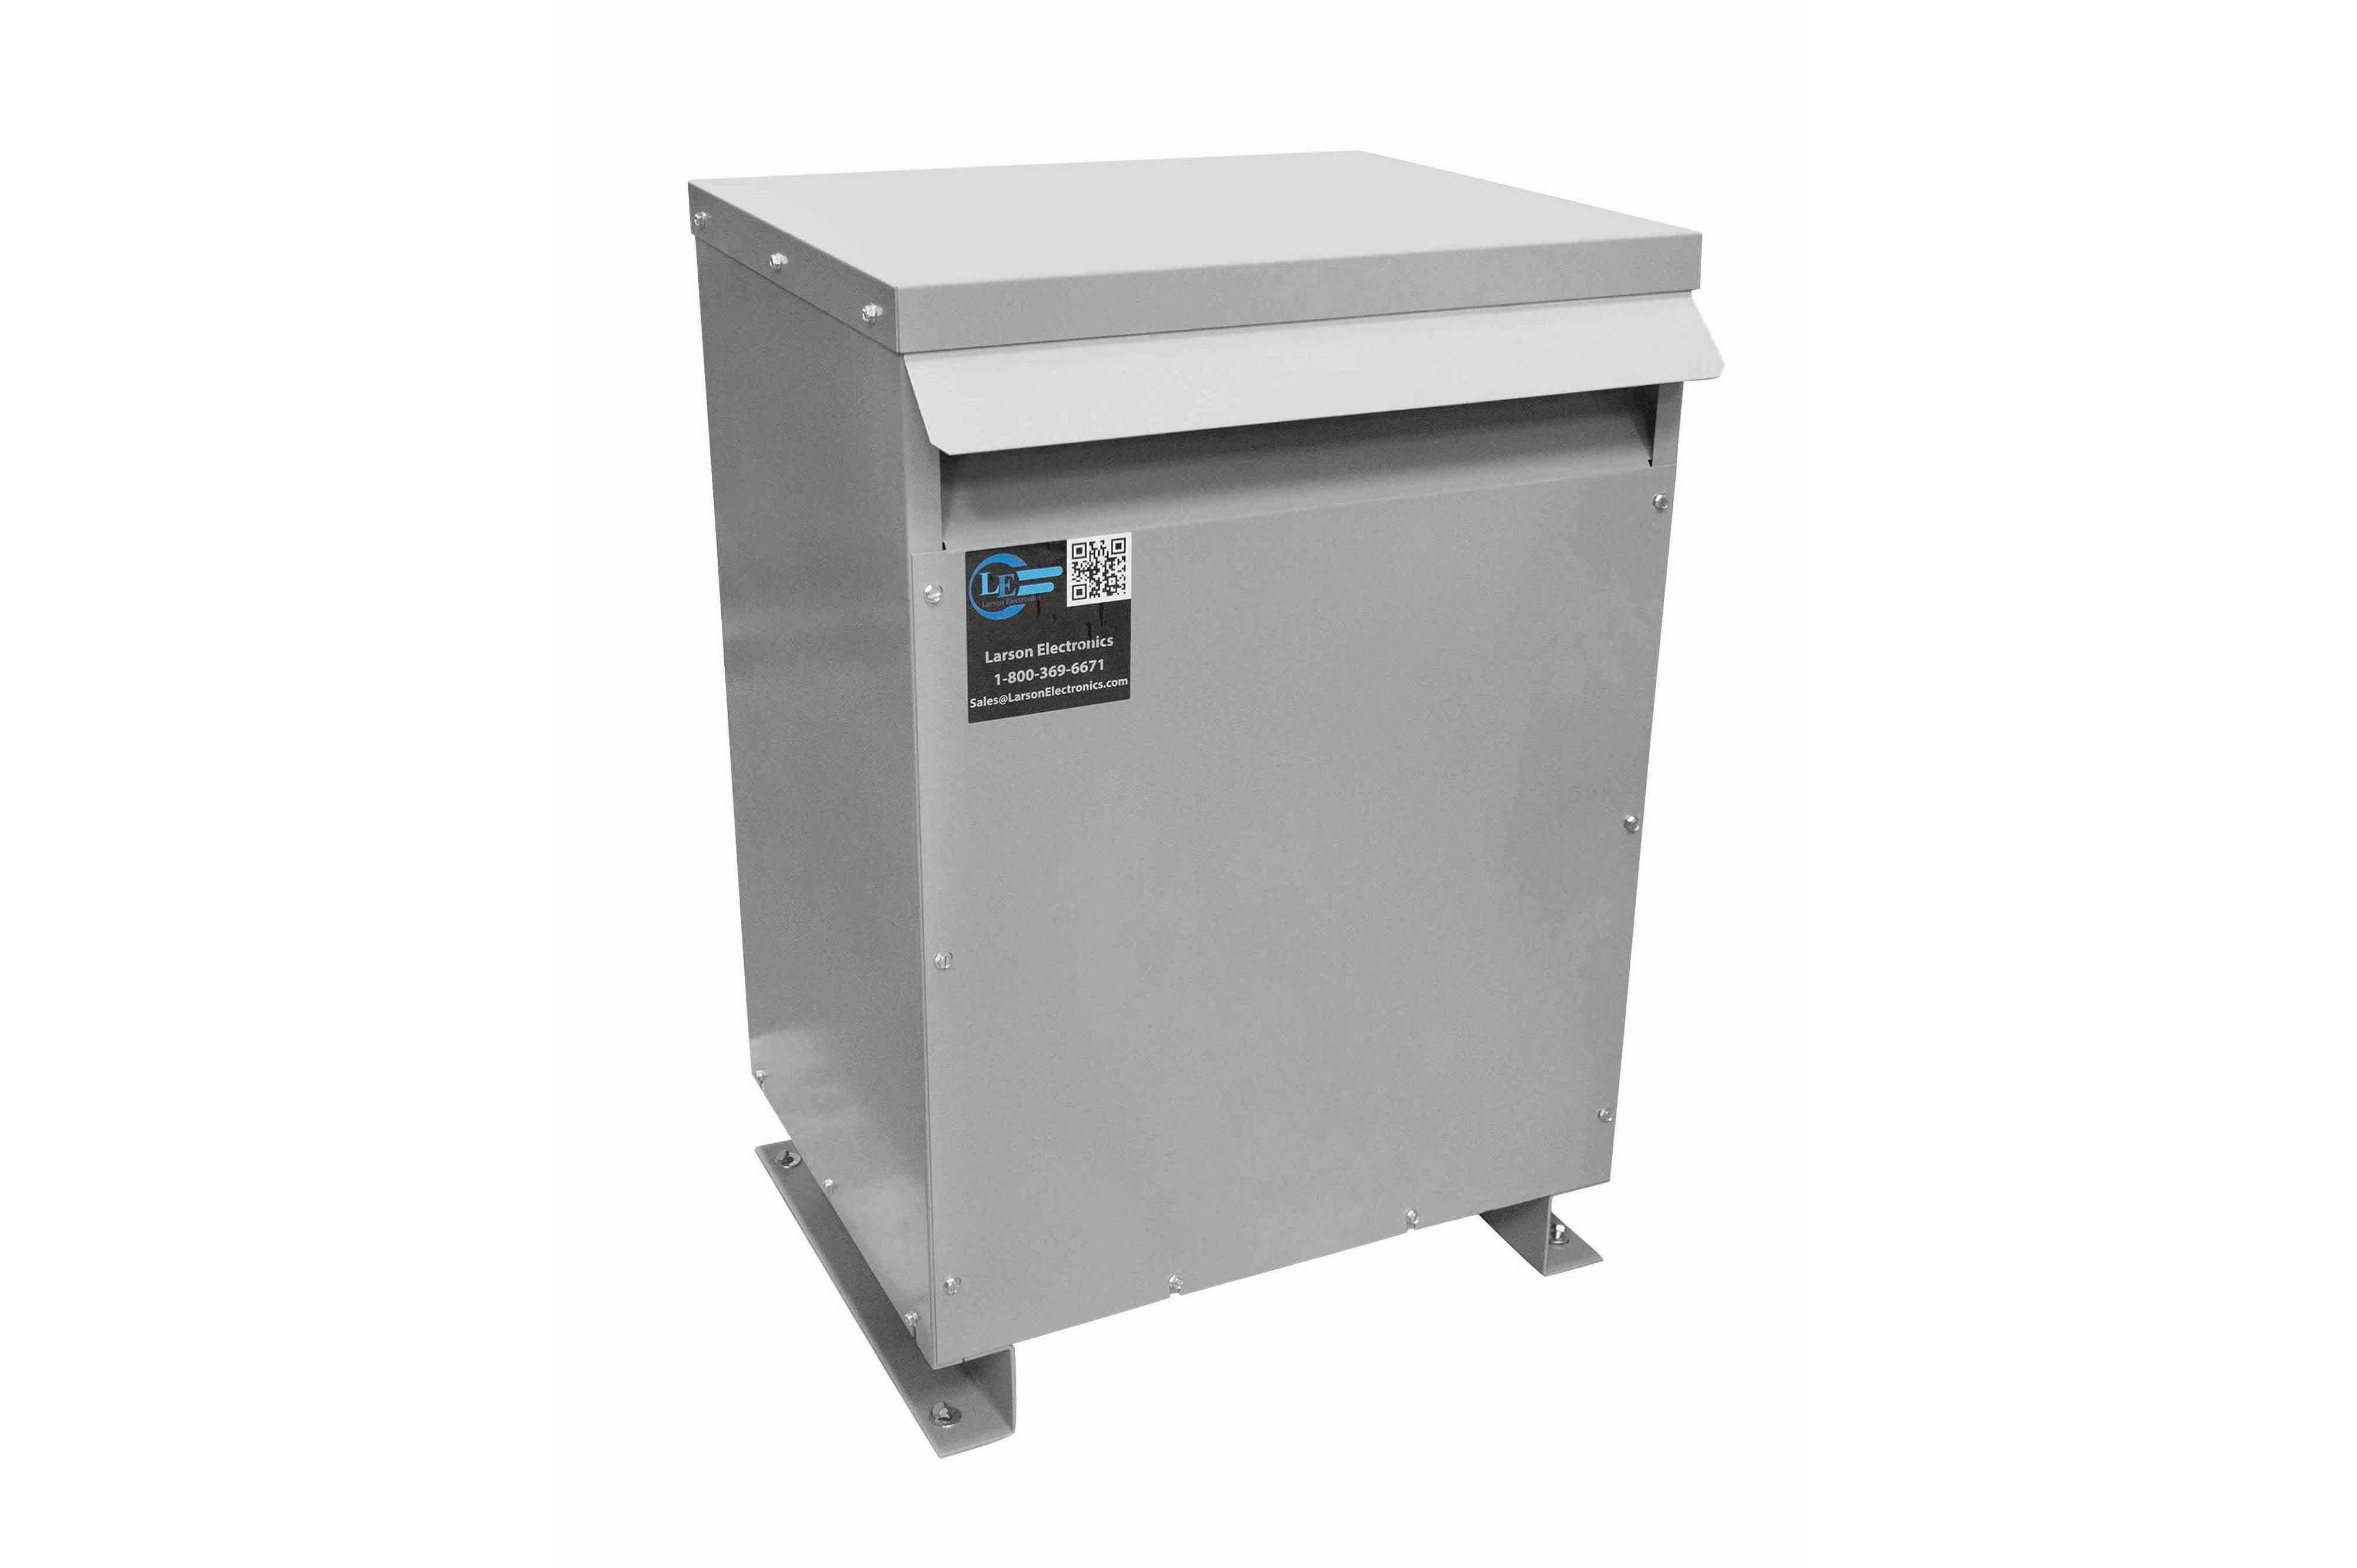 11 kVA 3PH Isolation Transformer, 480V Wye Primary, 600V Delta Secondary, N3R, Ventilated, 60 Hz